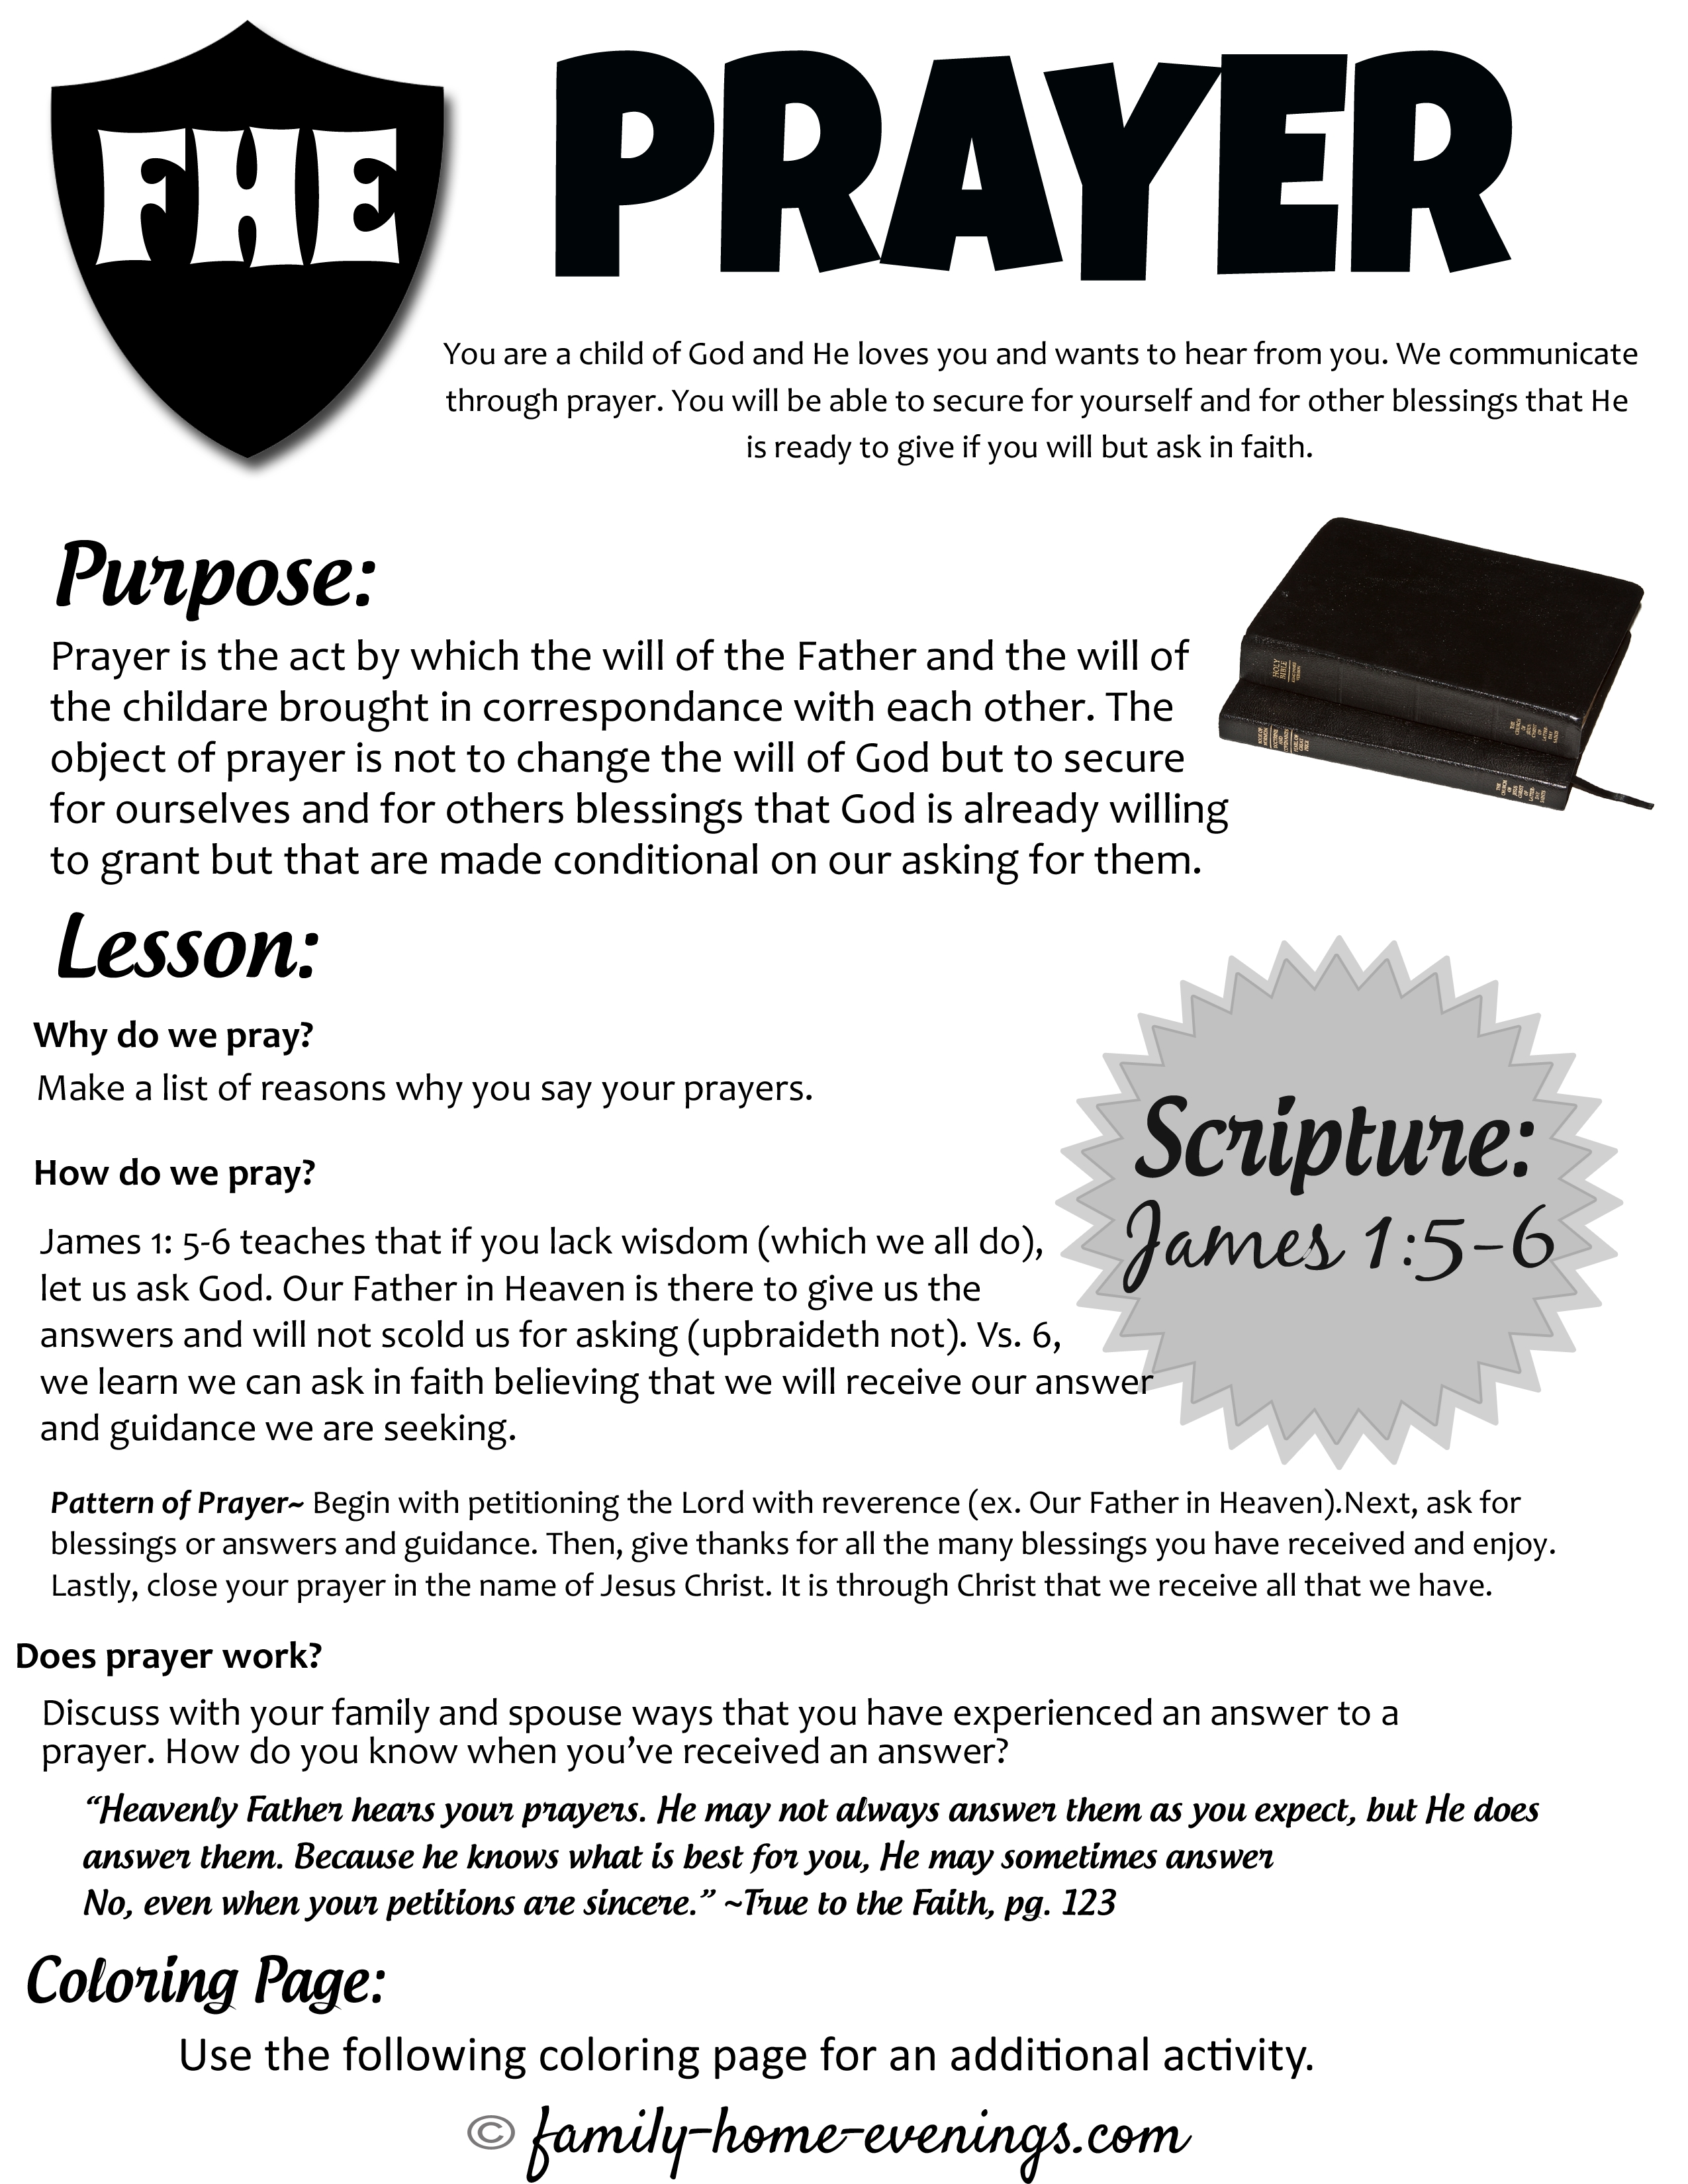 10 Unique Family Home Evening Lesson Ideas teach kids about prayer family home evening lesson on learning how